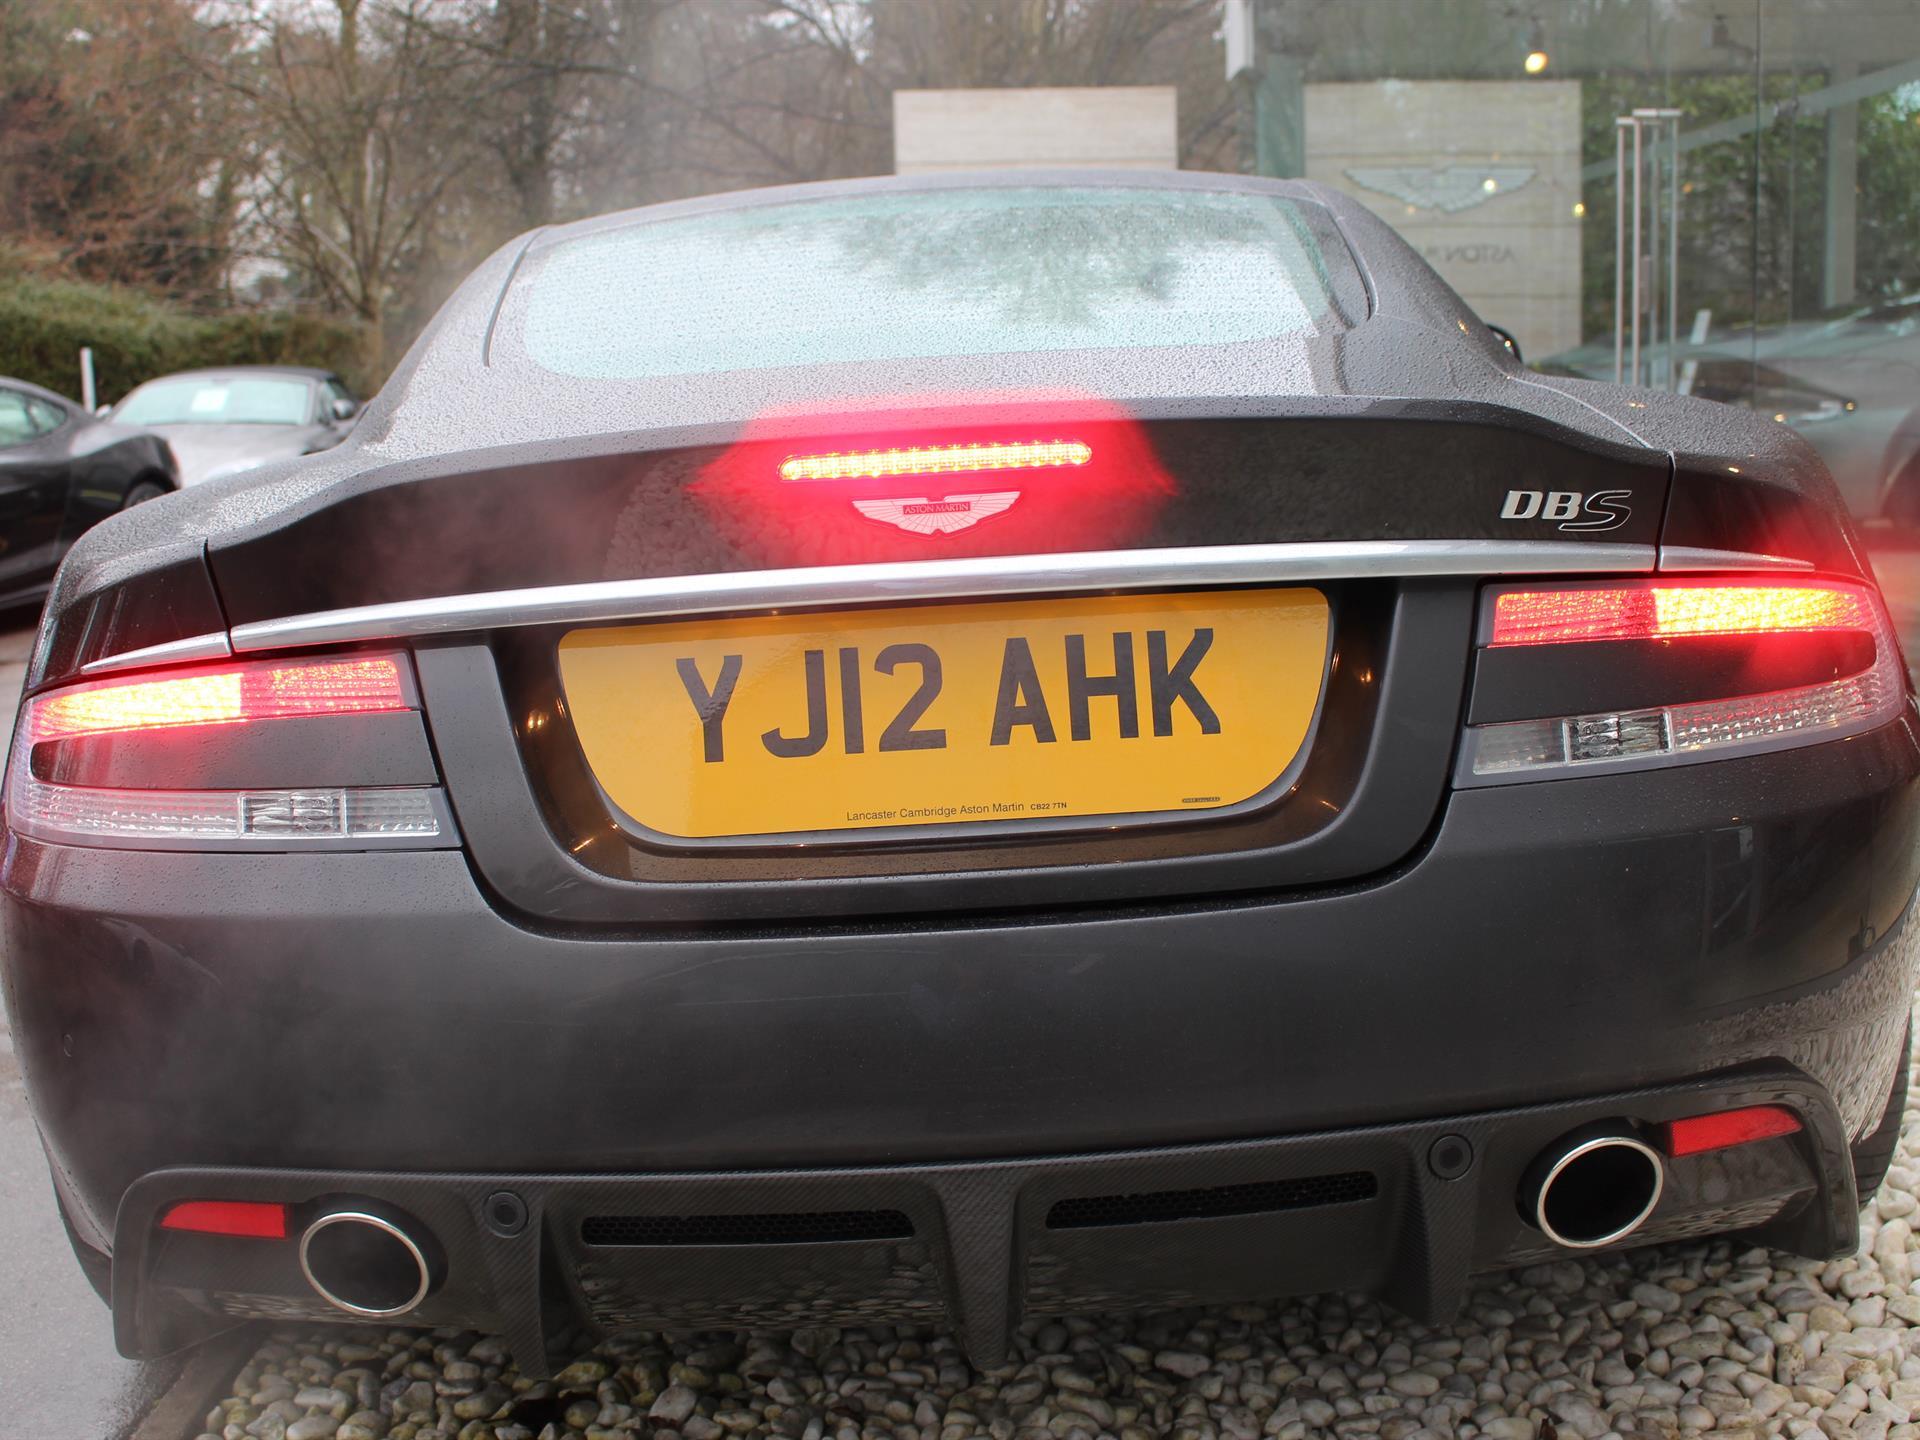 Aston Martin Lagonda - Pre-Owned & Used Aston Martins - Car Details